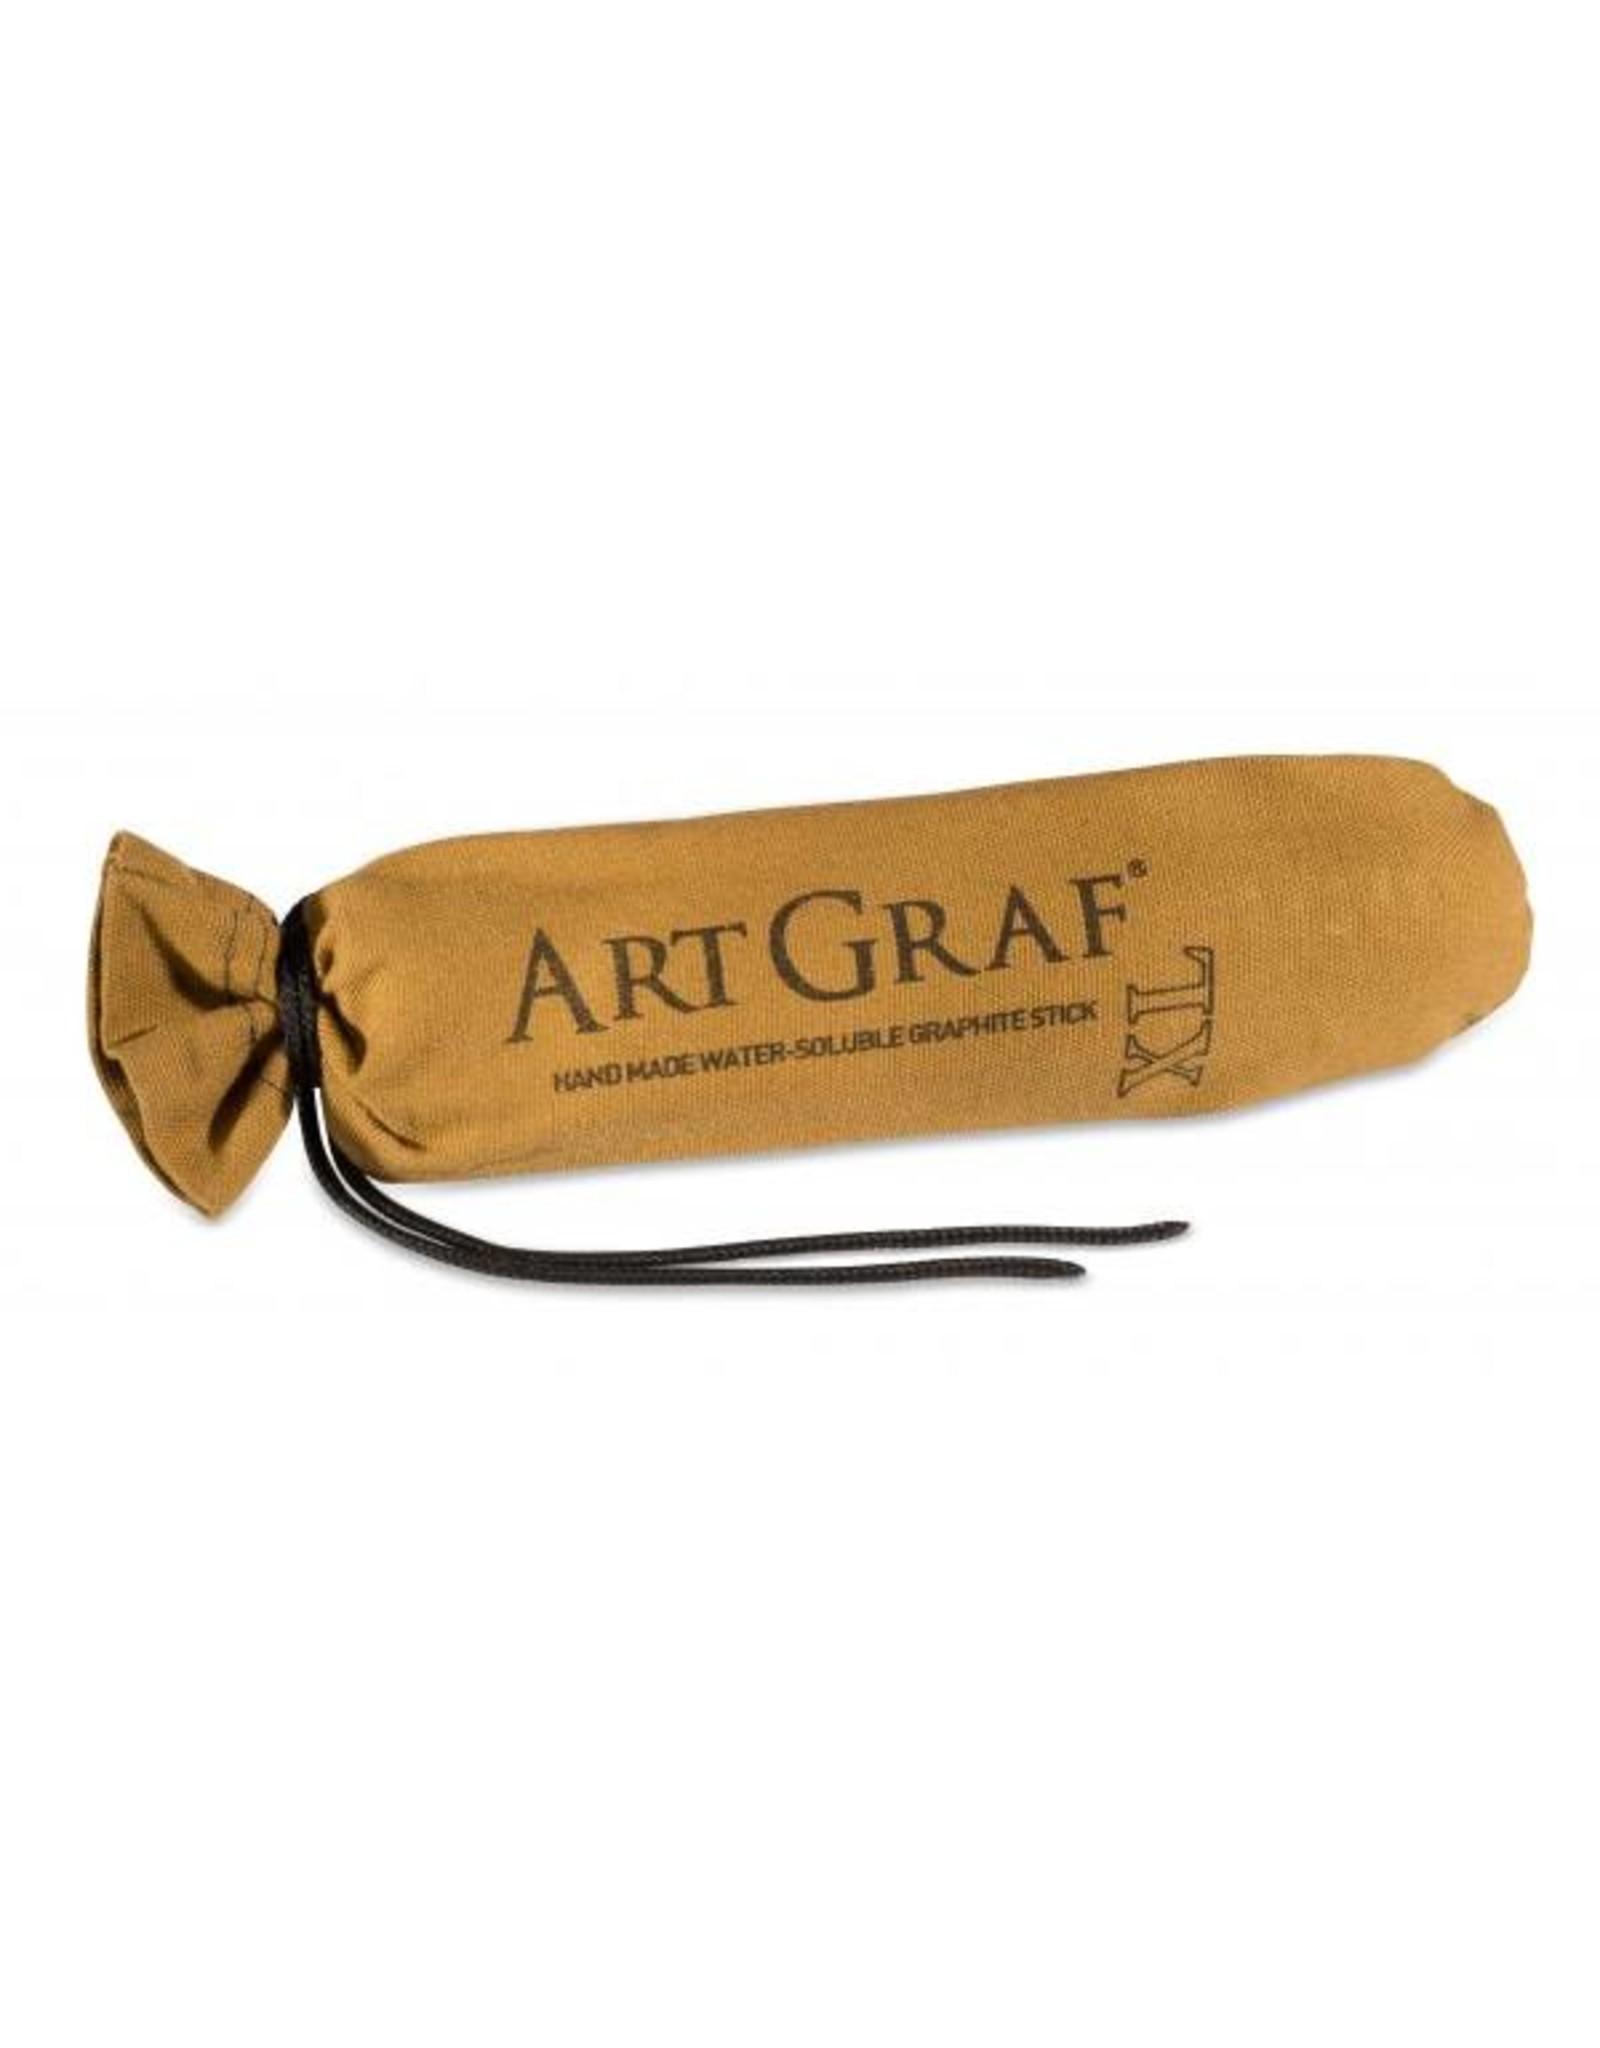 Viarco ArtGraf XL